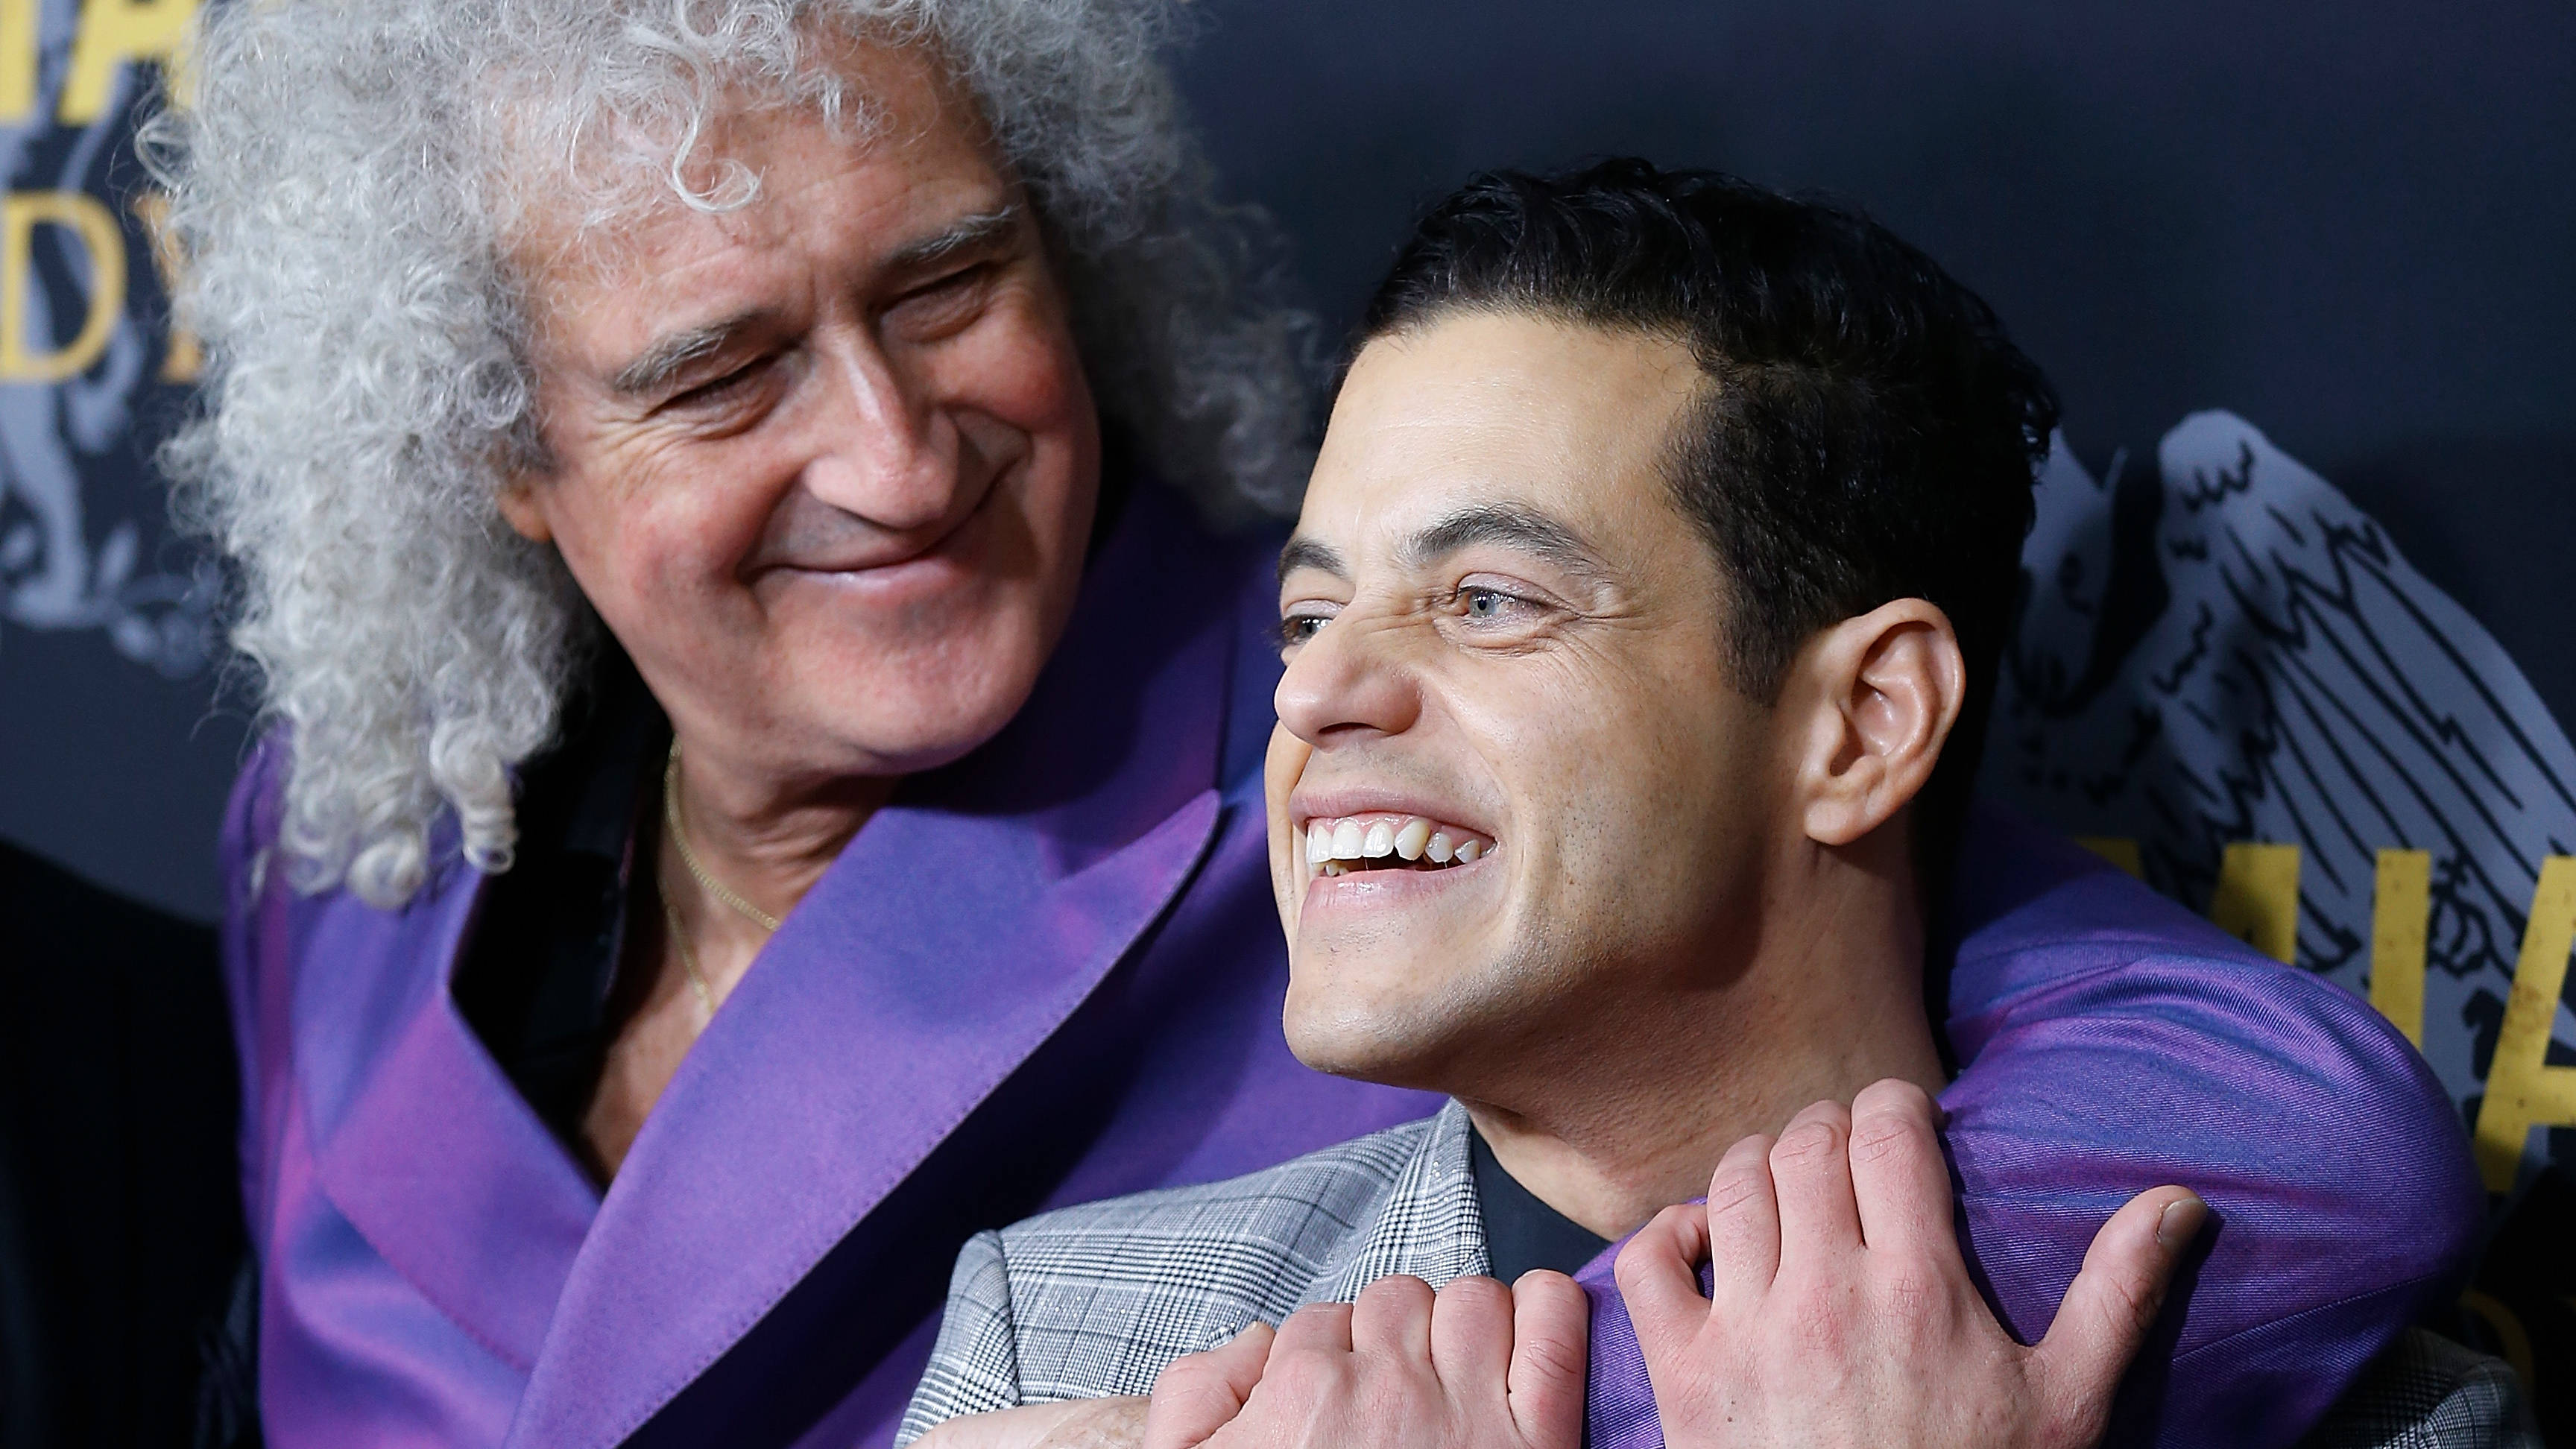 Rami Malek defends Bohemian Rhapsody for not showing